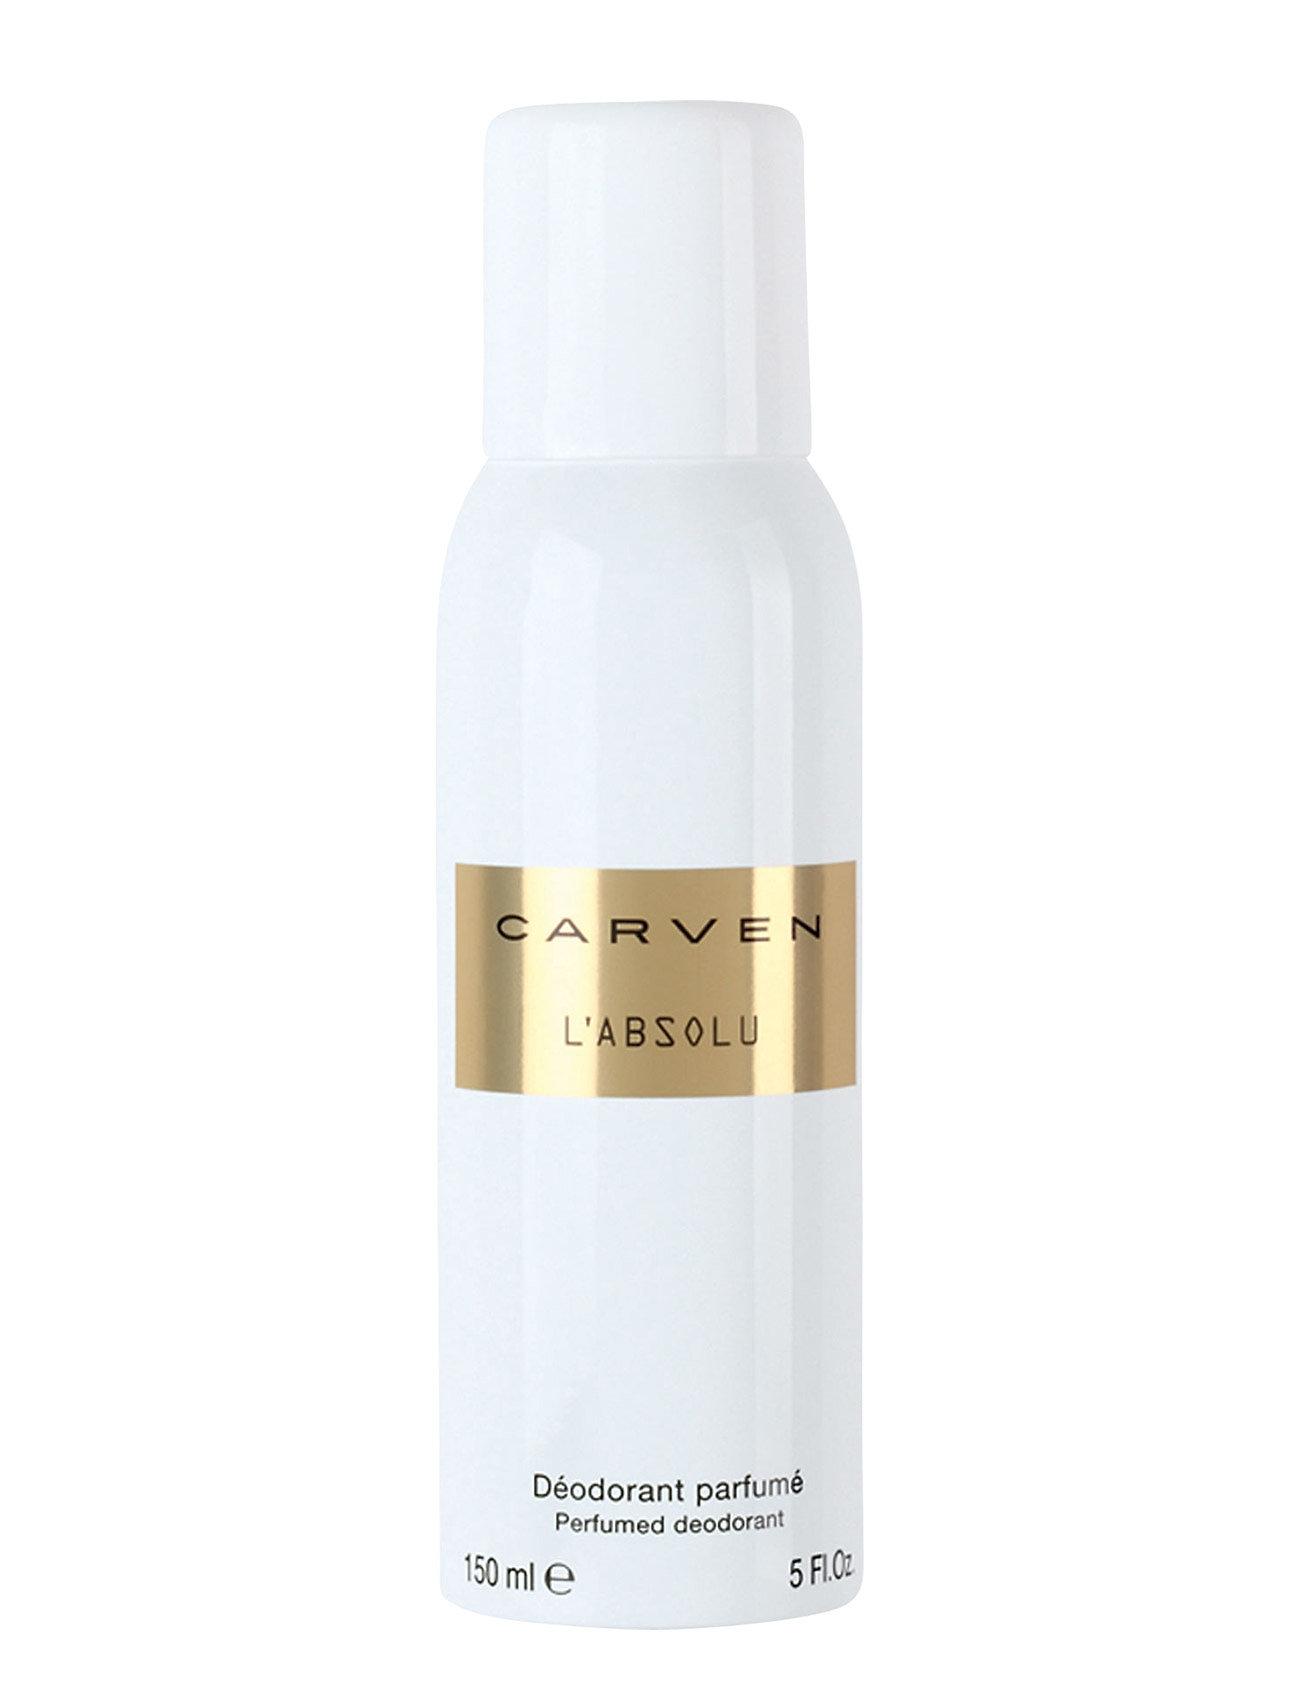 Carven L'Absolu Perfumed Déodorant Natural Spray 150mL - CLEAR